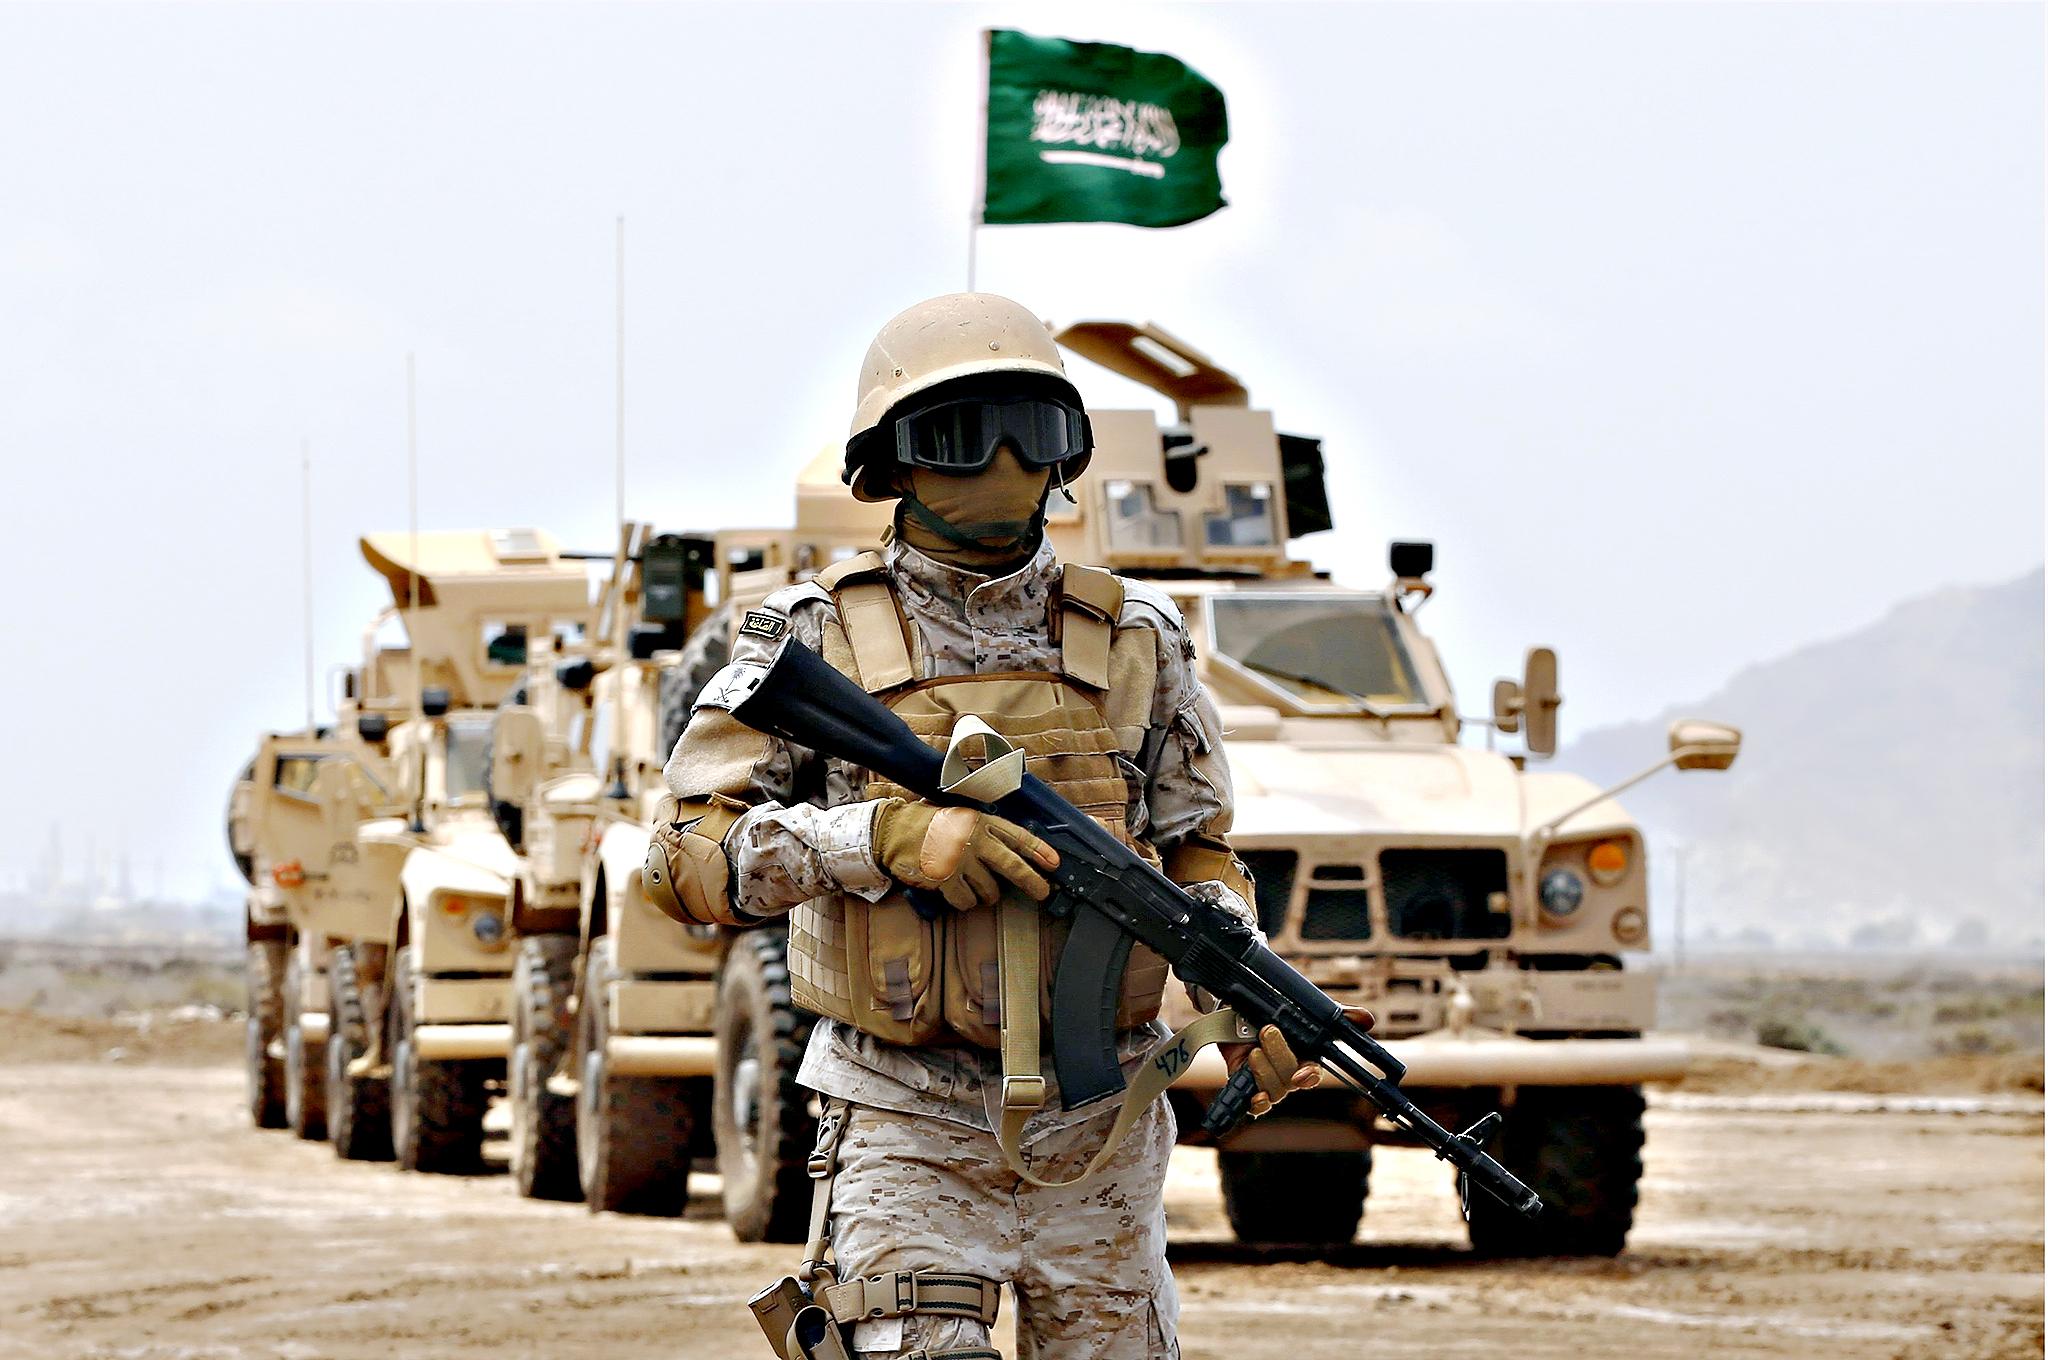 2018/02/Saudi-Army_1518711078.jpg